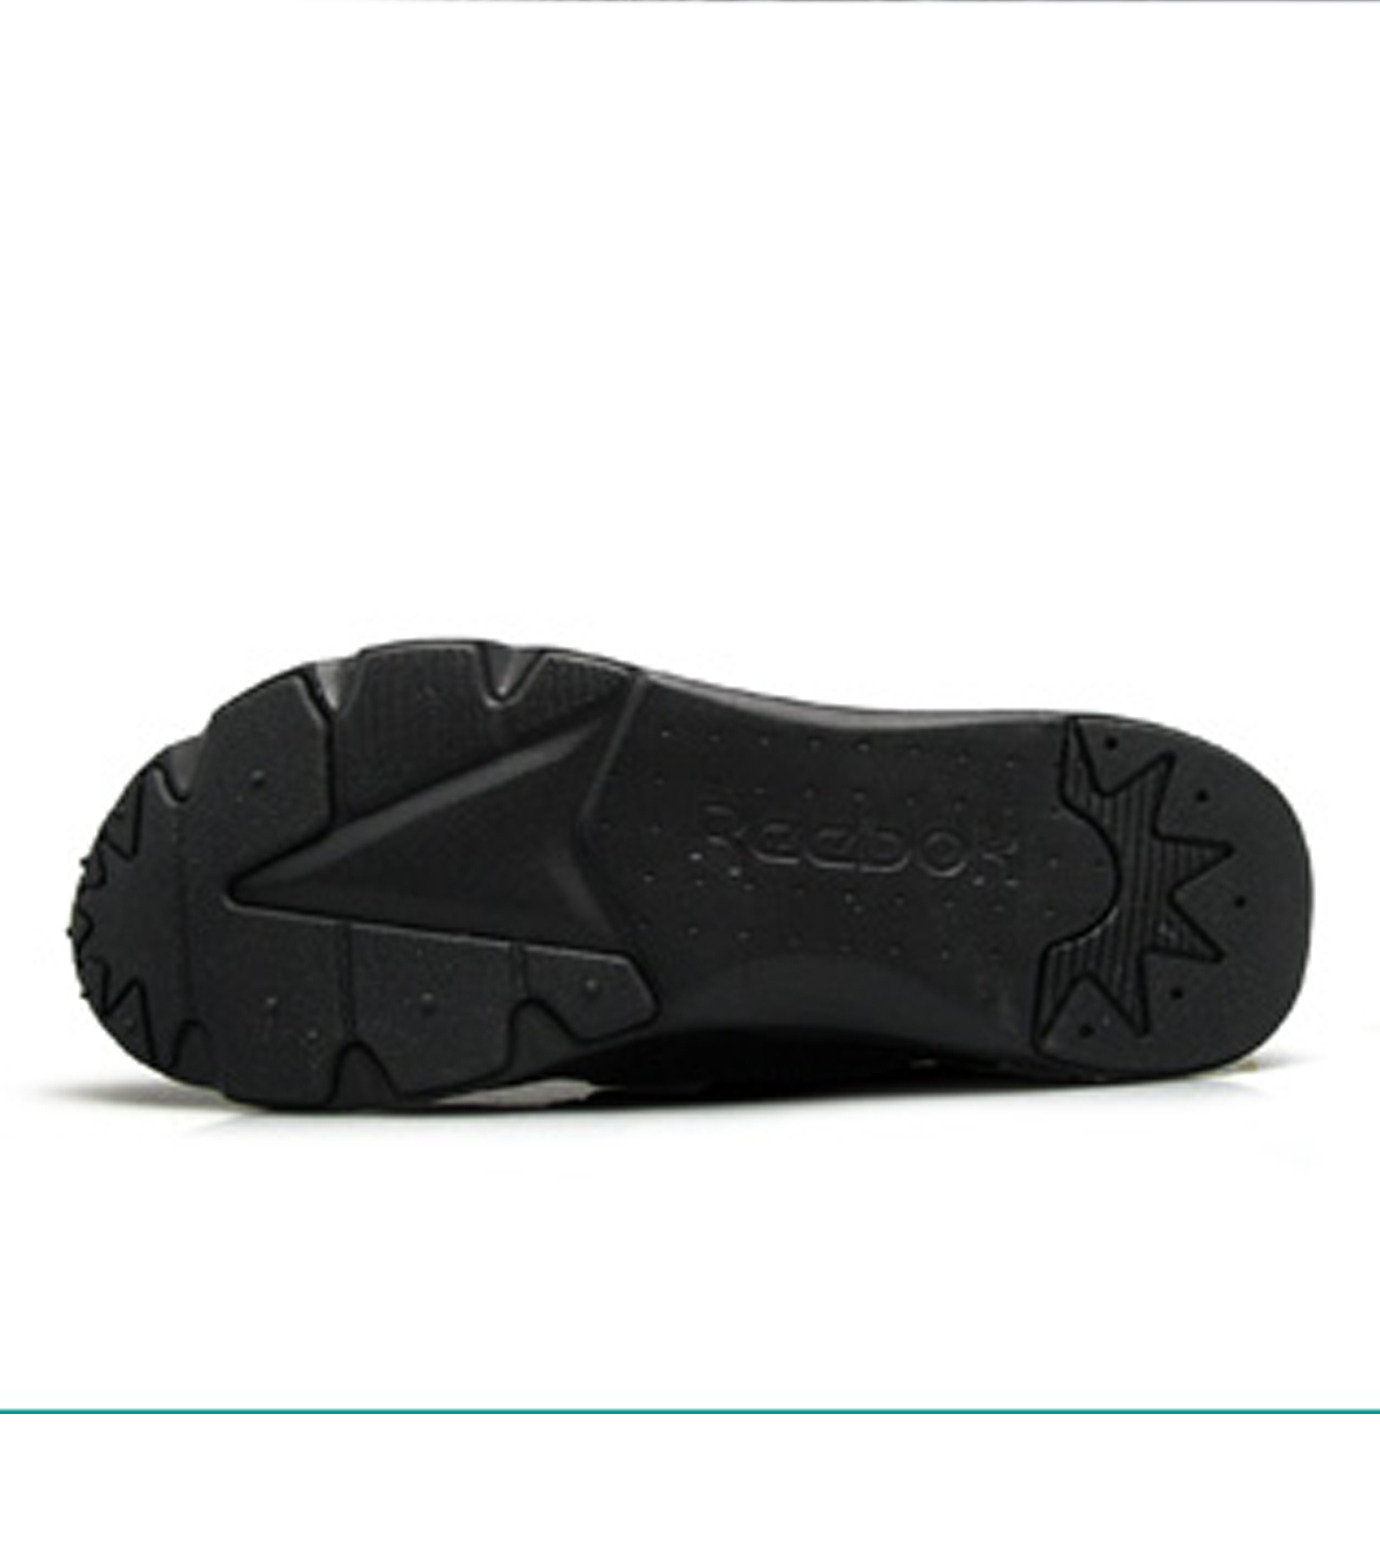 Reebok(リーボック)のFURYLITE-BLACK(シューズ/shoes)-V67159-13 拡大詳細画像2